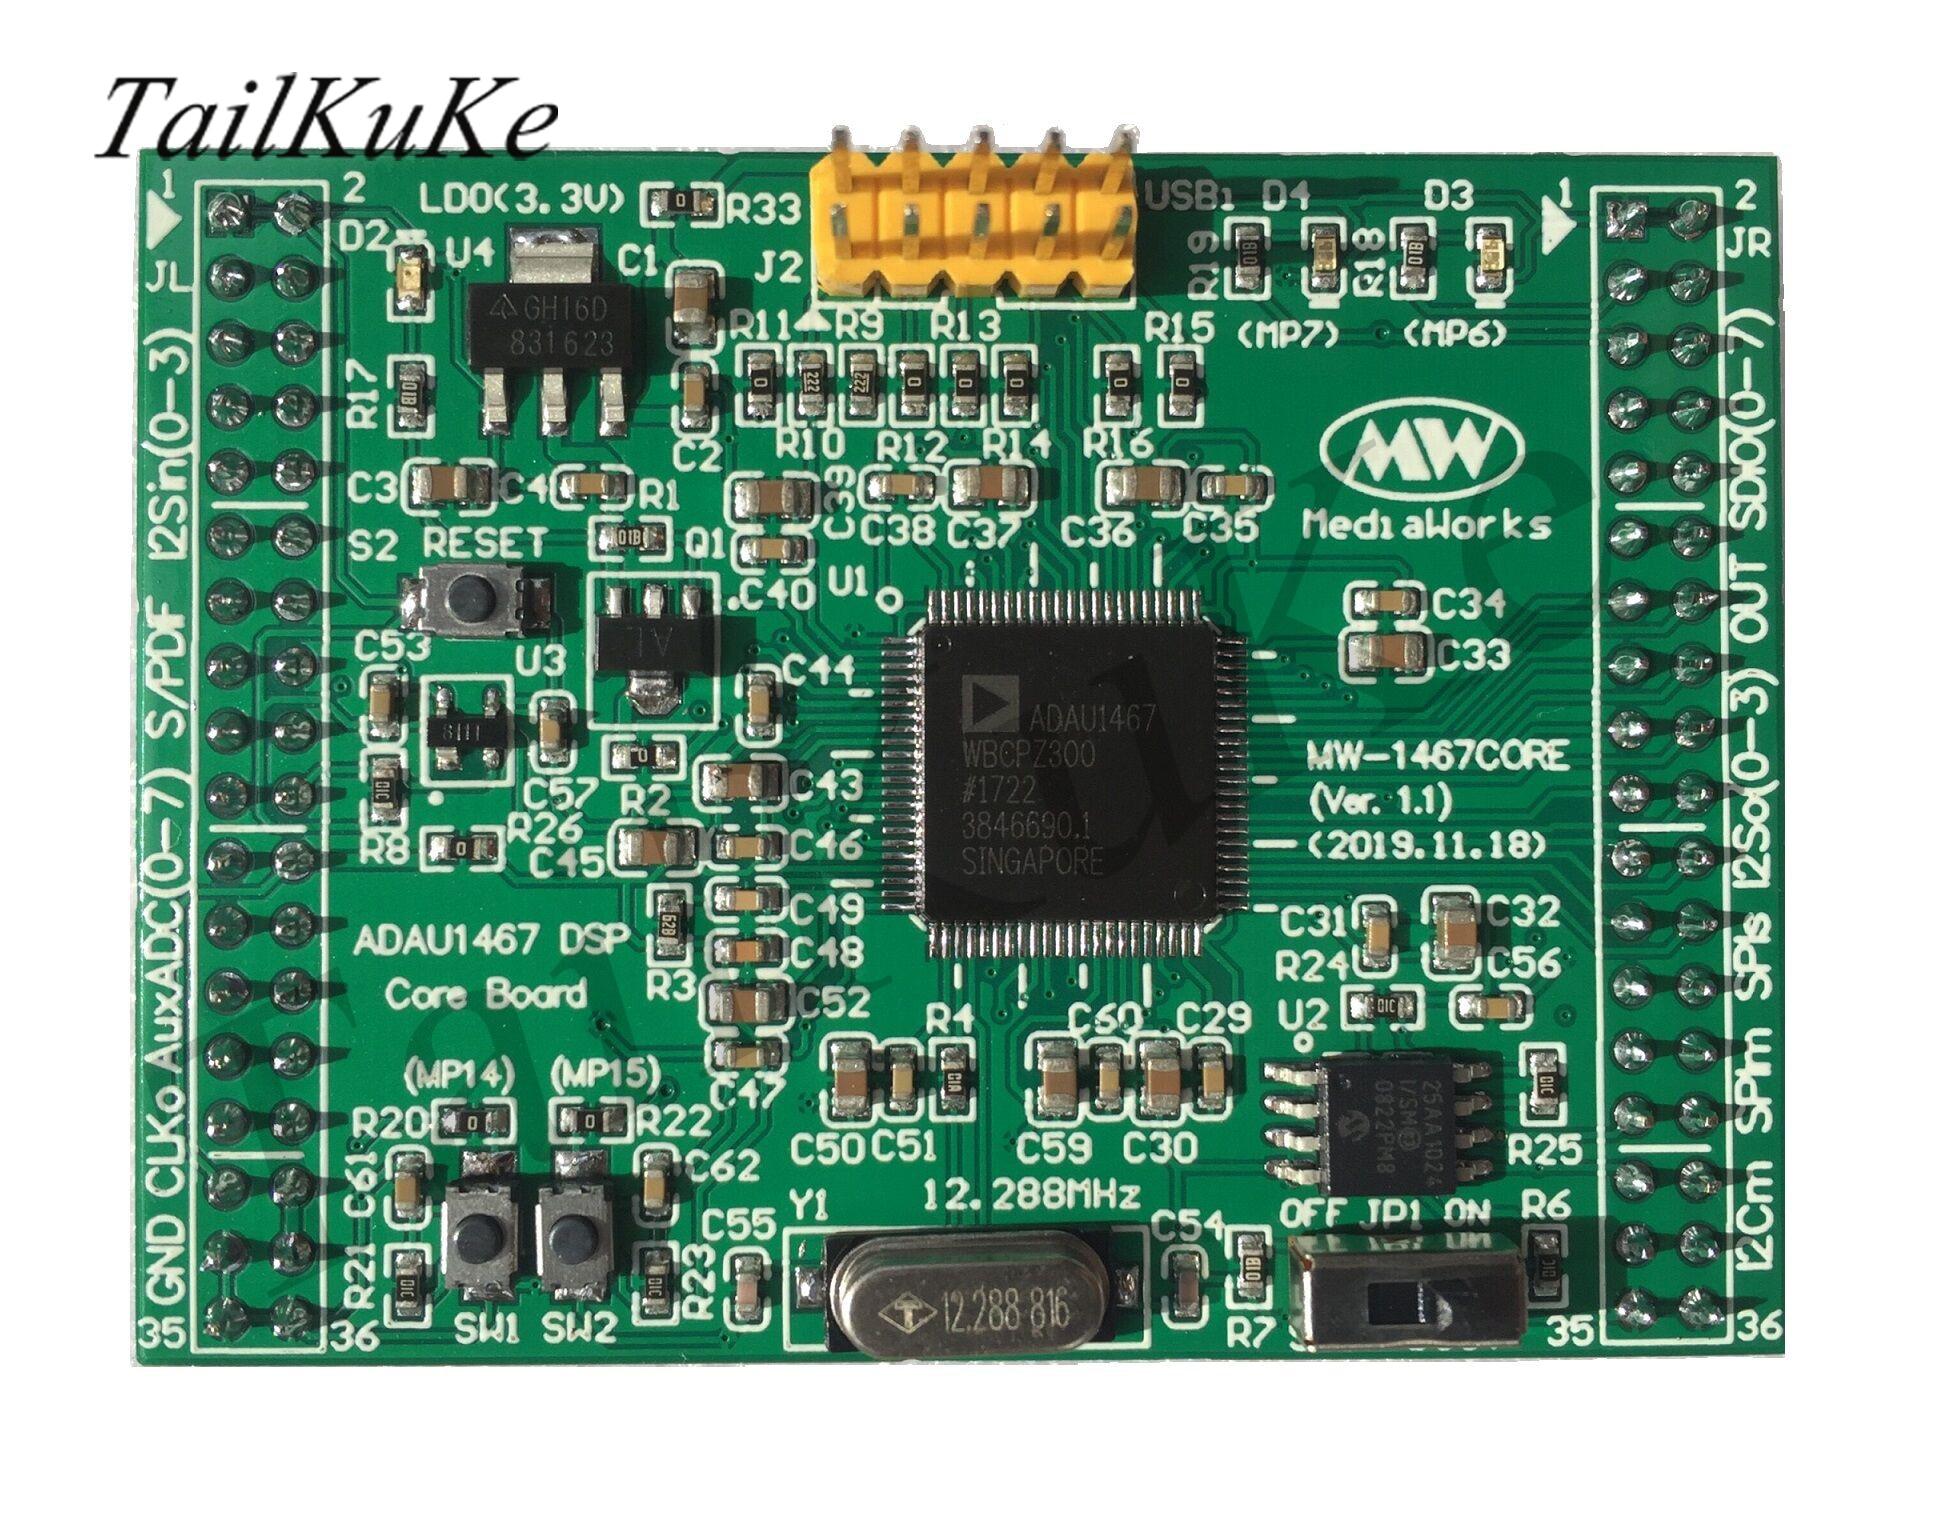 ADAU1467 DSP Core Board (NEW!)